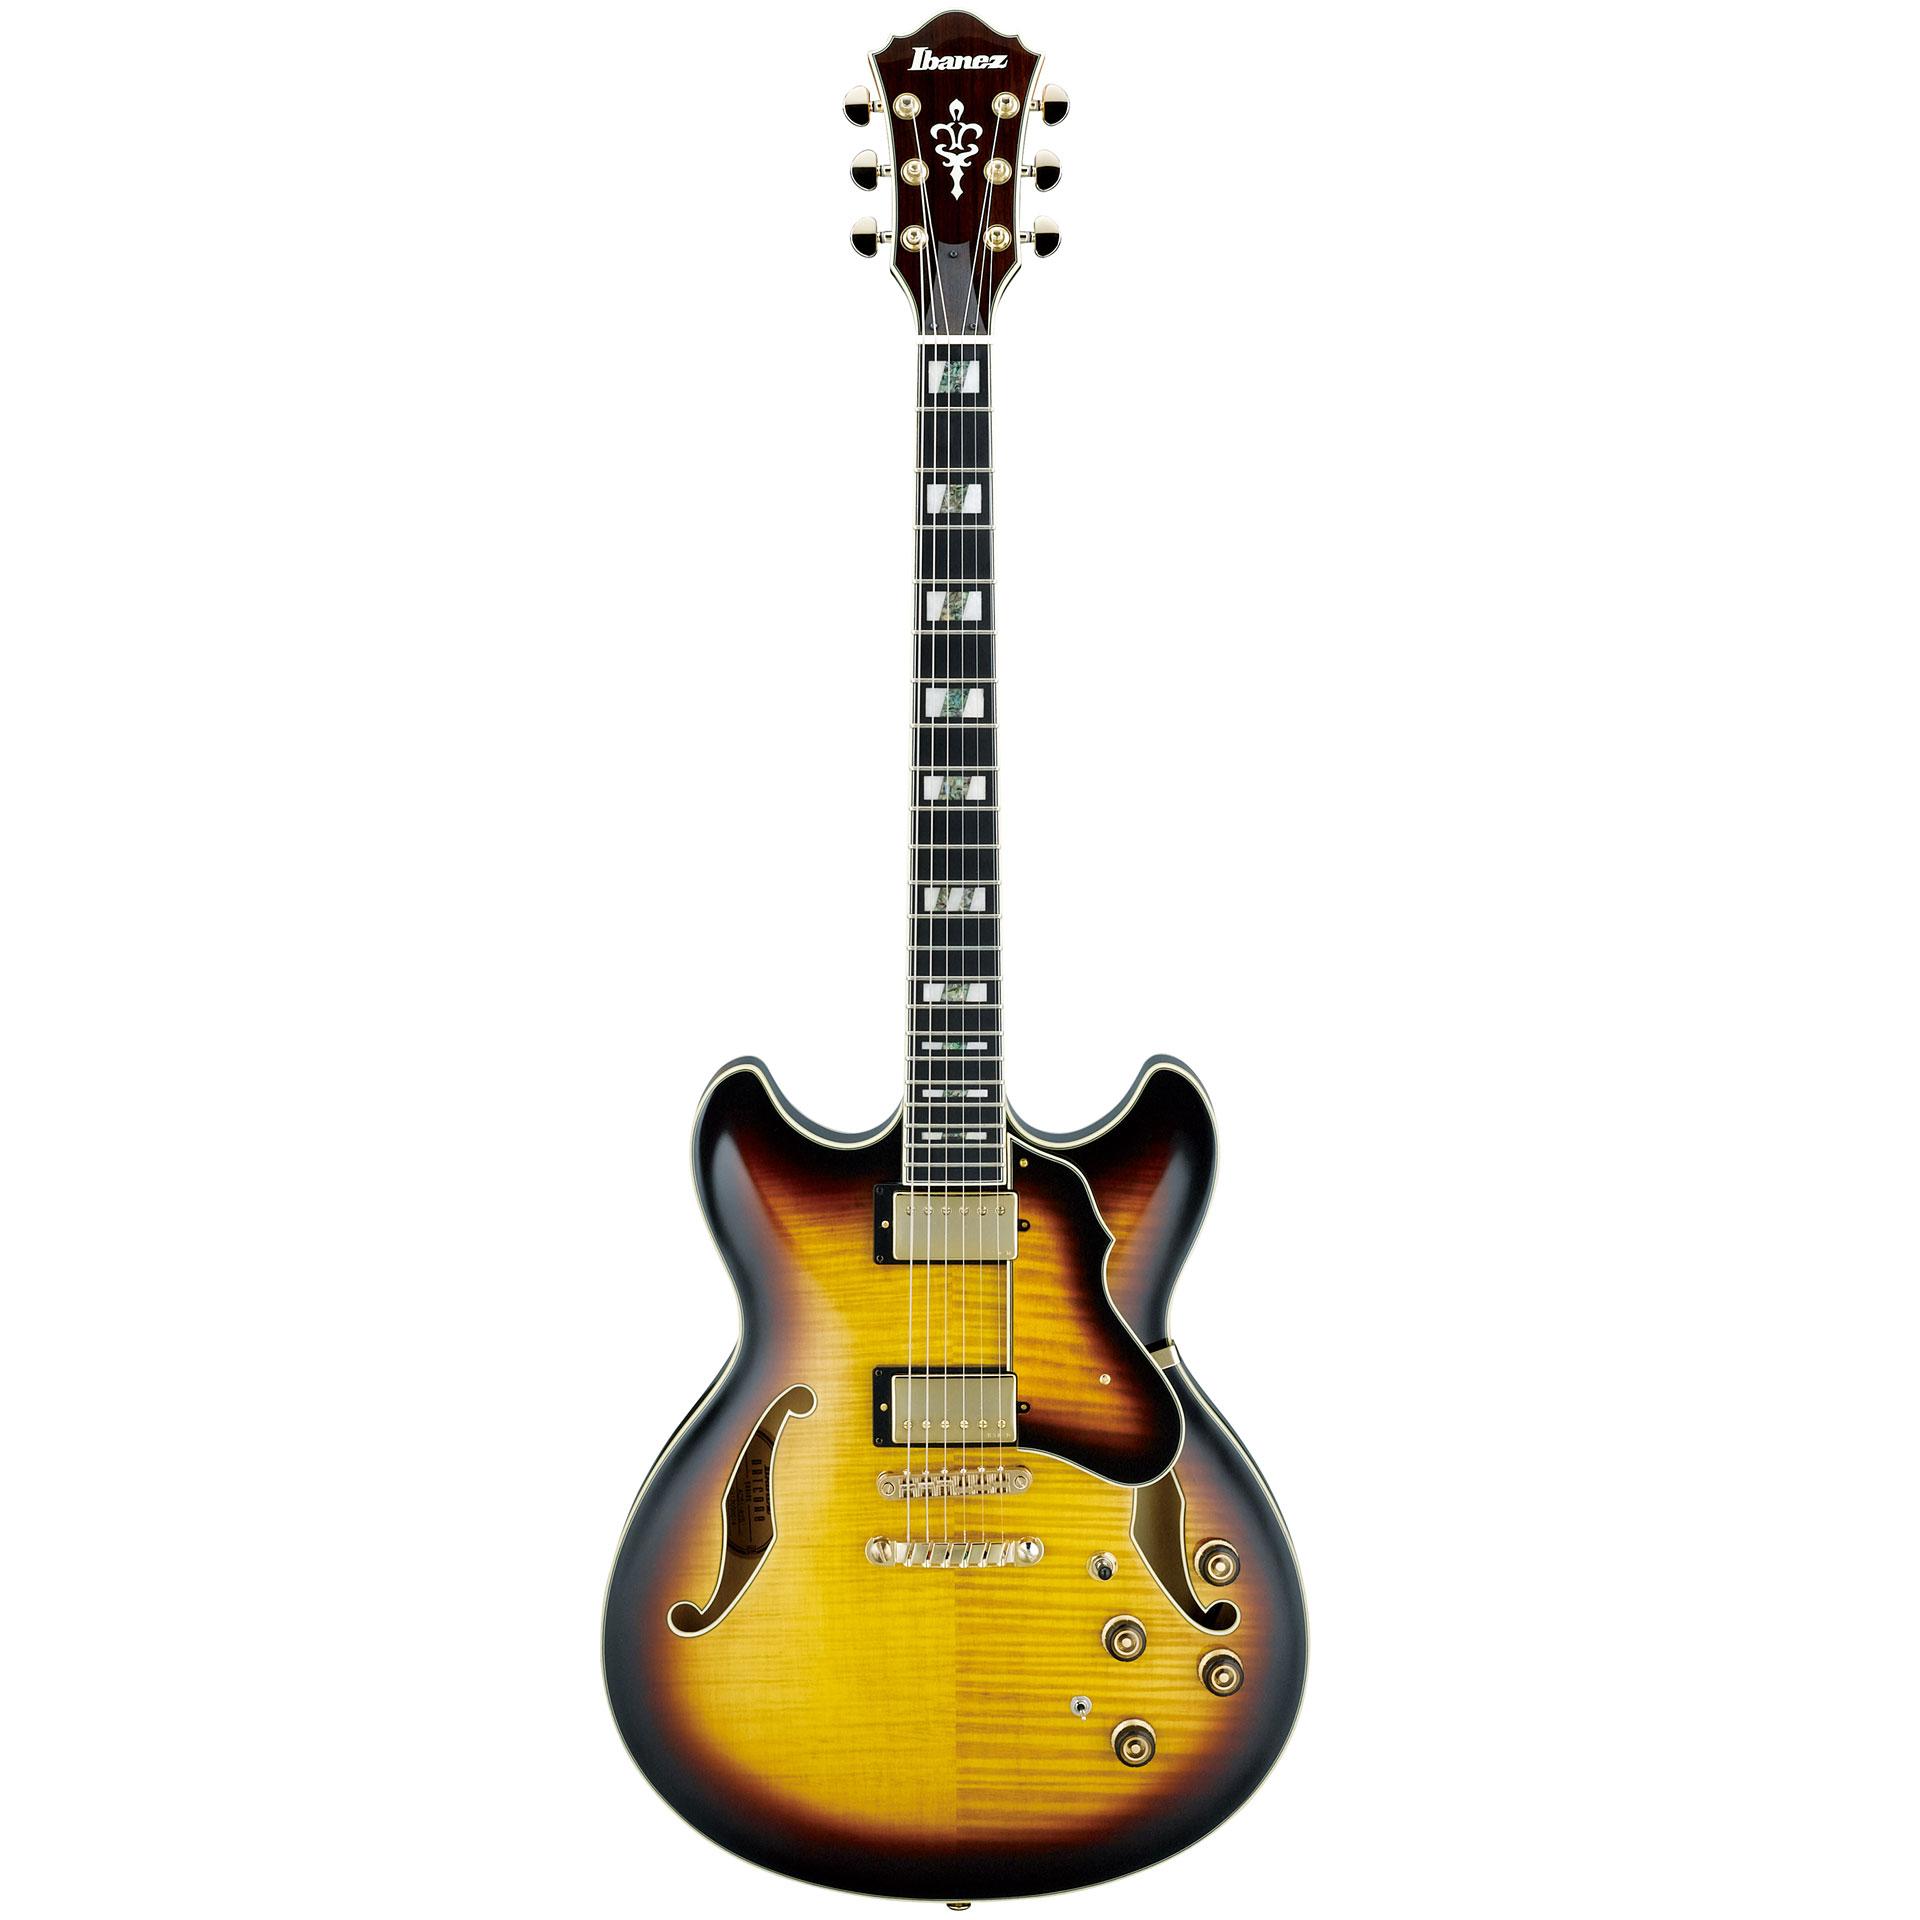 ibanez artstar as153 ays electric guitar. Black Bedroom Furniture Sets. Home Design Ideas